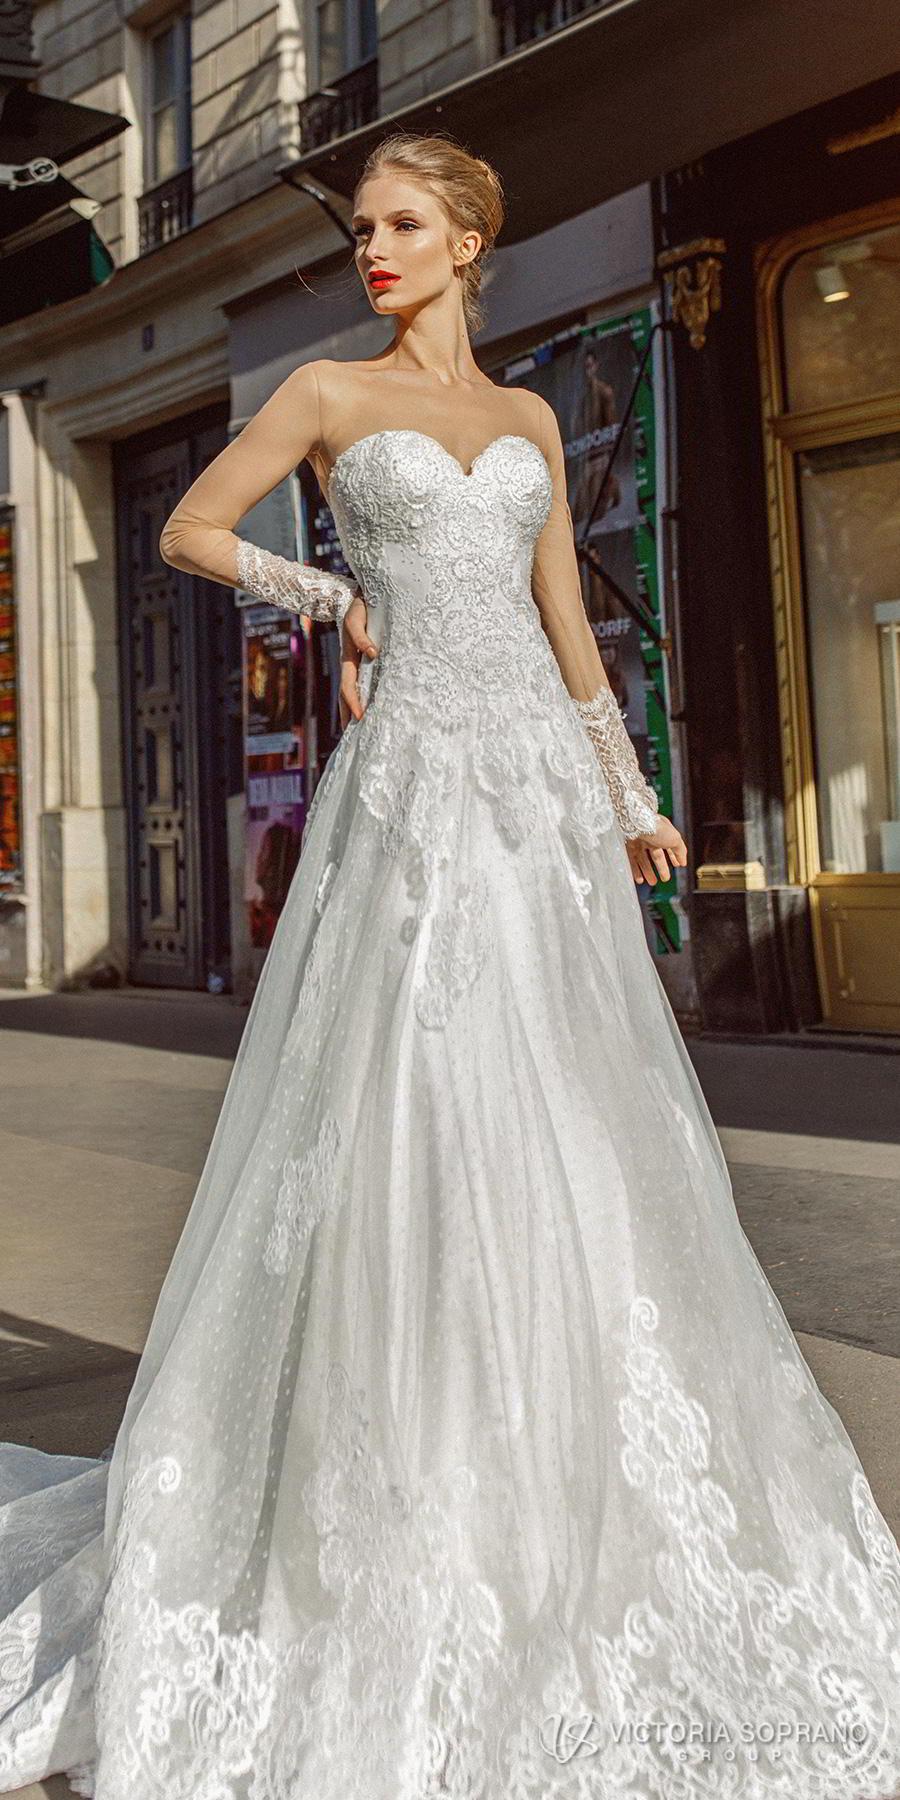 victoria soprano 2019 bridal long sleeves illusion bateau sweetheart neckline heavily embellished bodice princess a  line wedding dress lace back chapel train (margo) lv